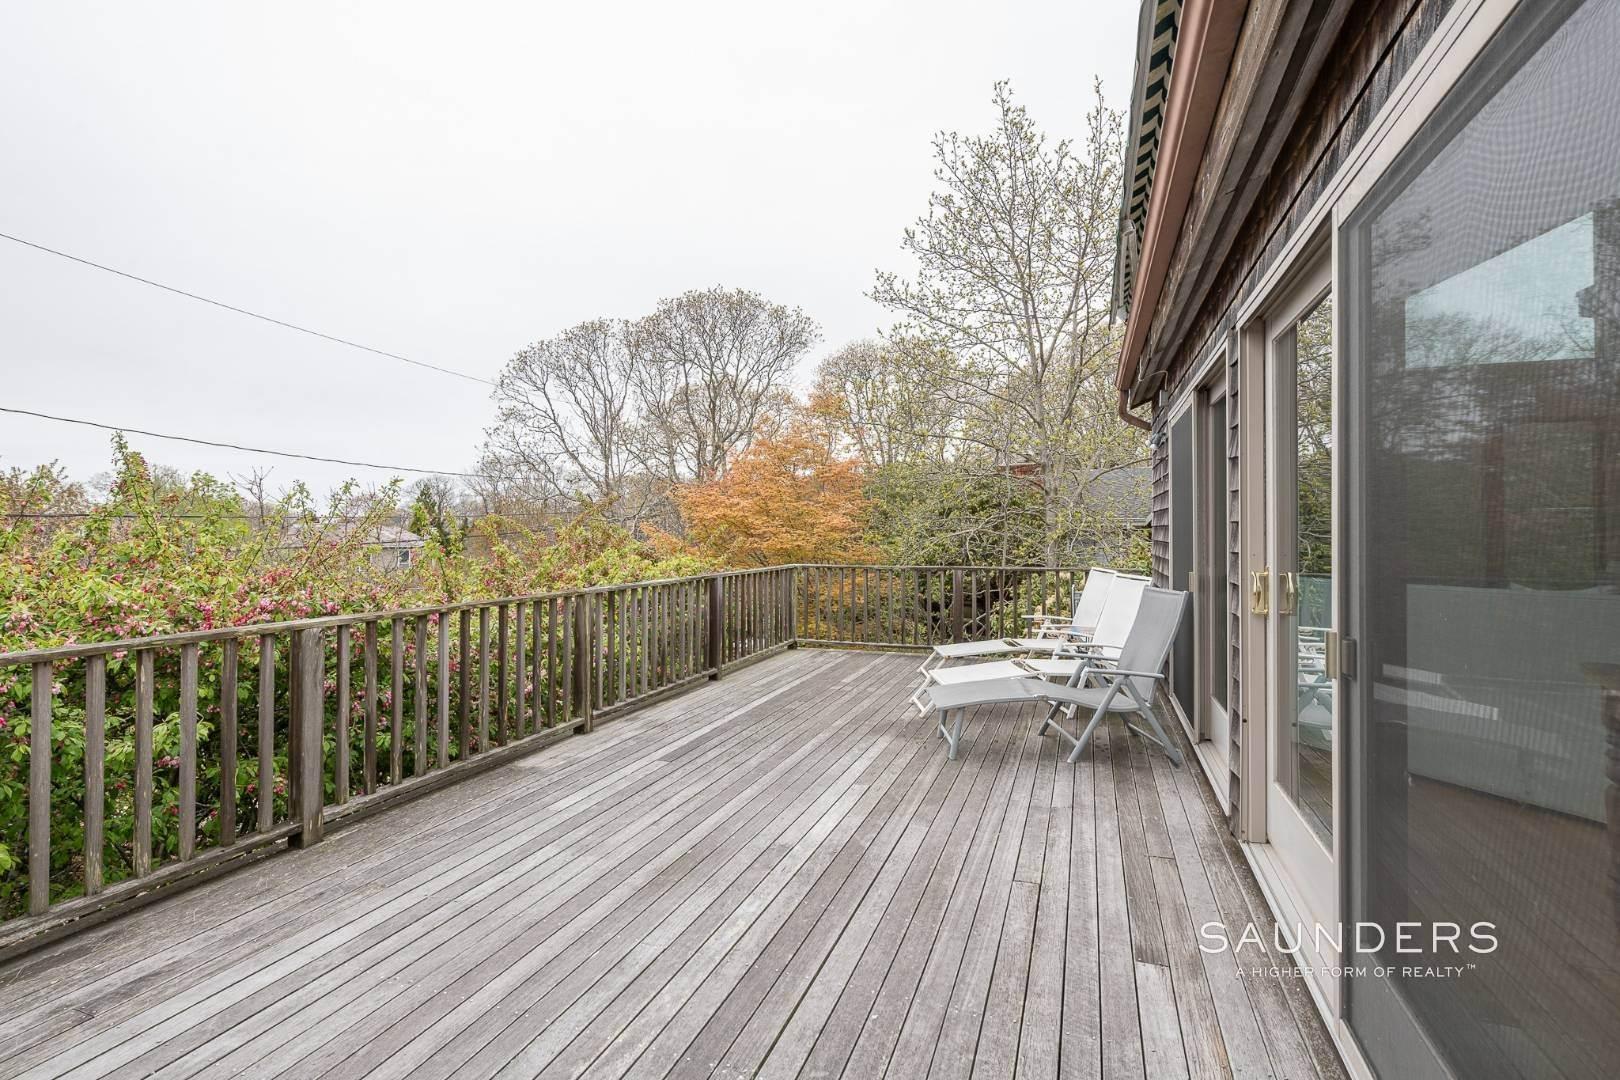 2. Single Family Homes for Sale at Montauk Beach House 8 Stuyvesant Drive, Montauk, East Hampton Town, NY 11954